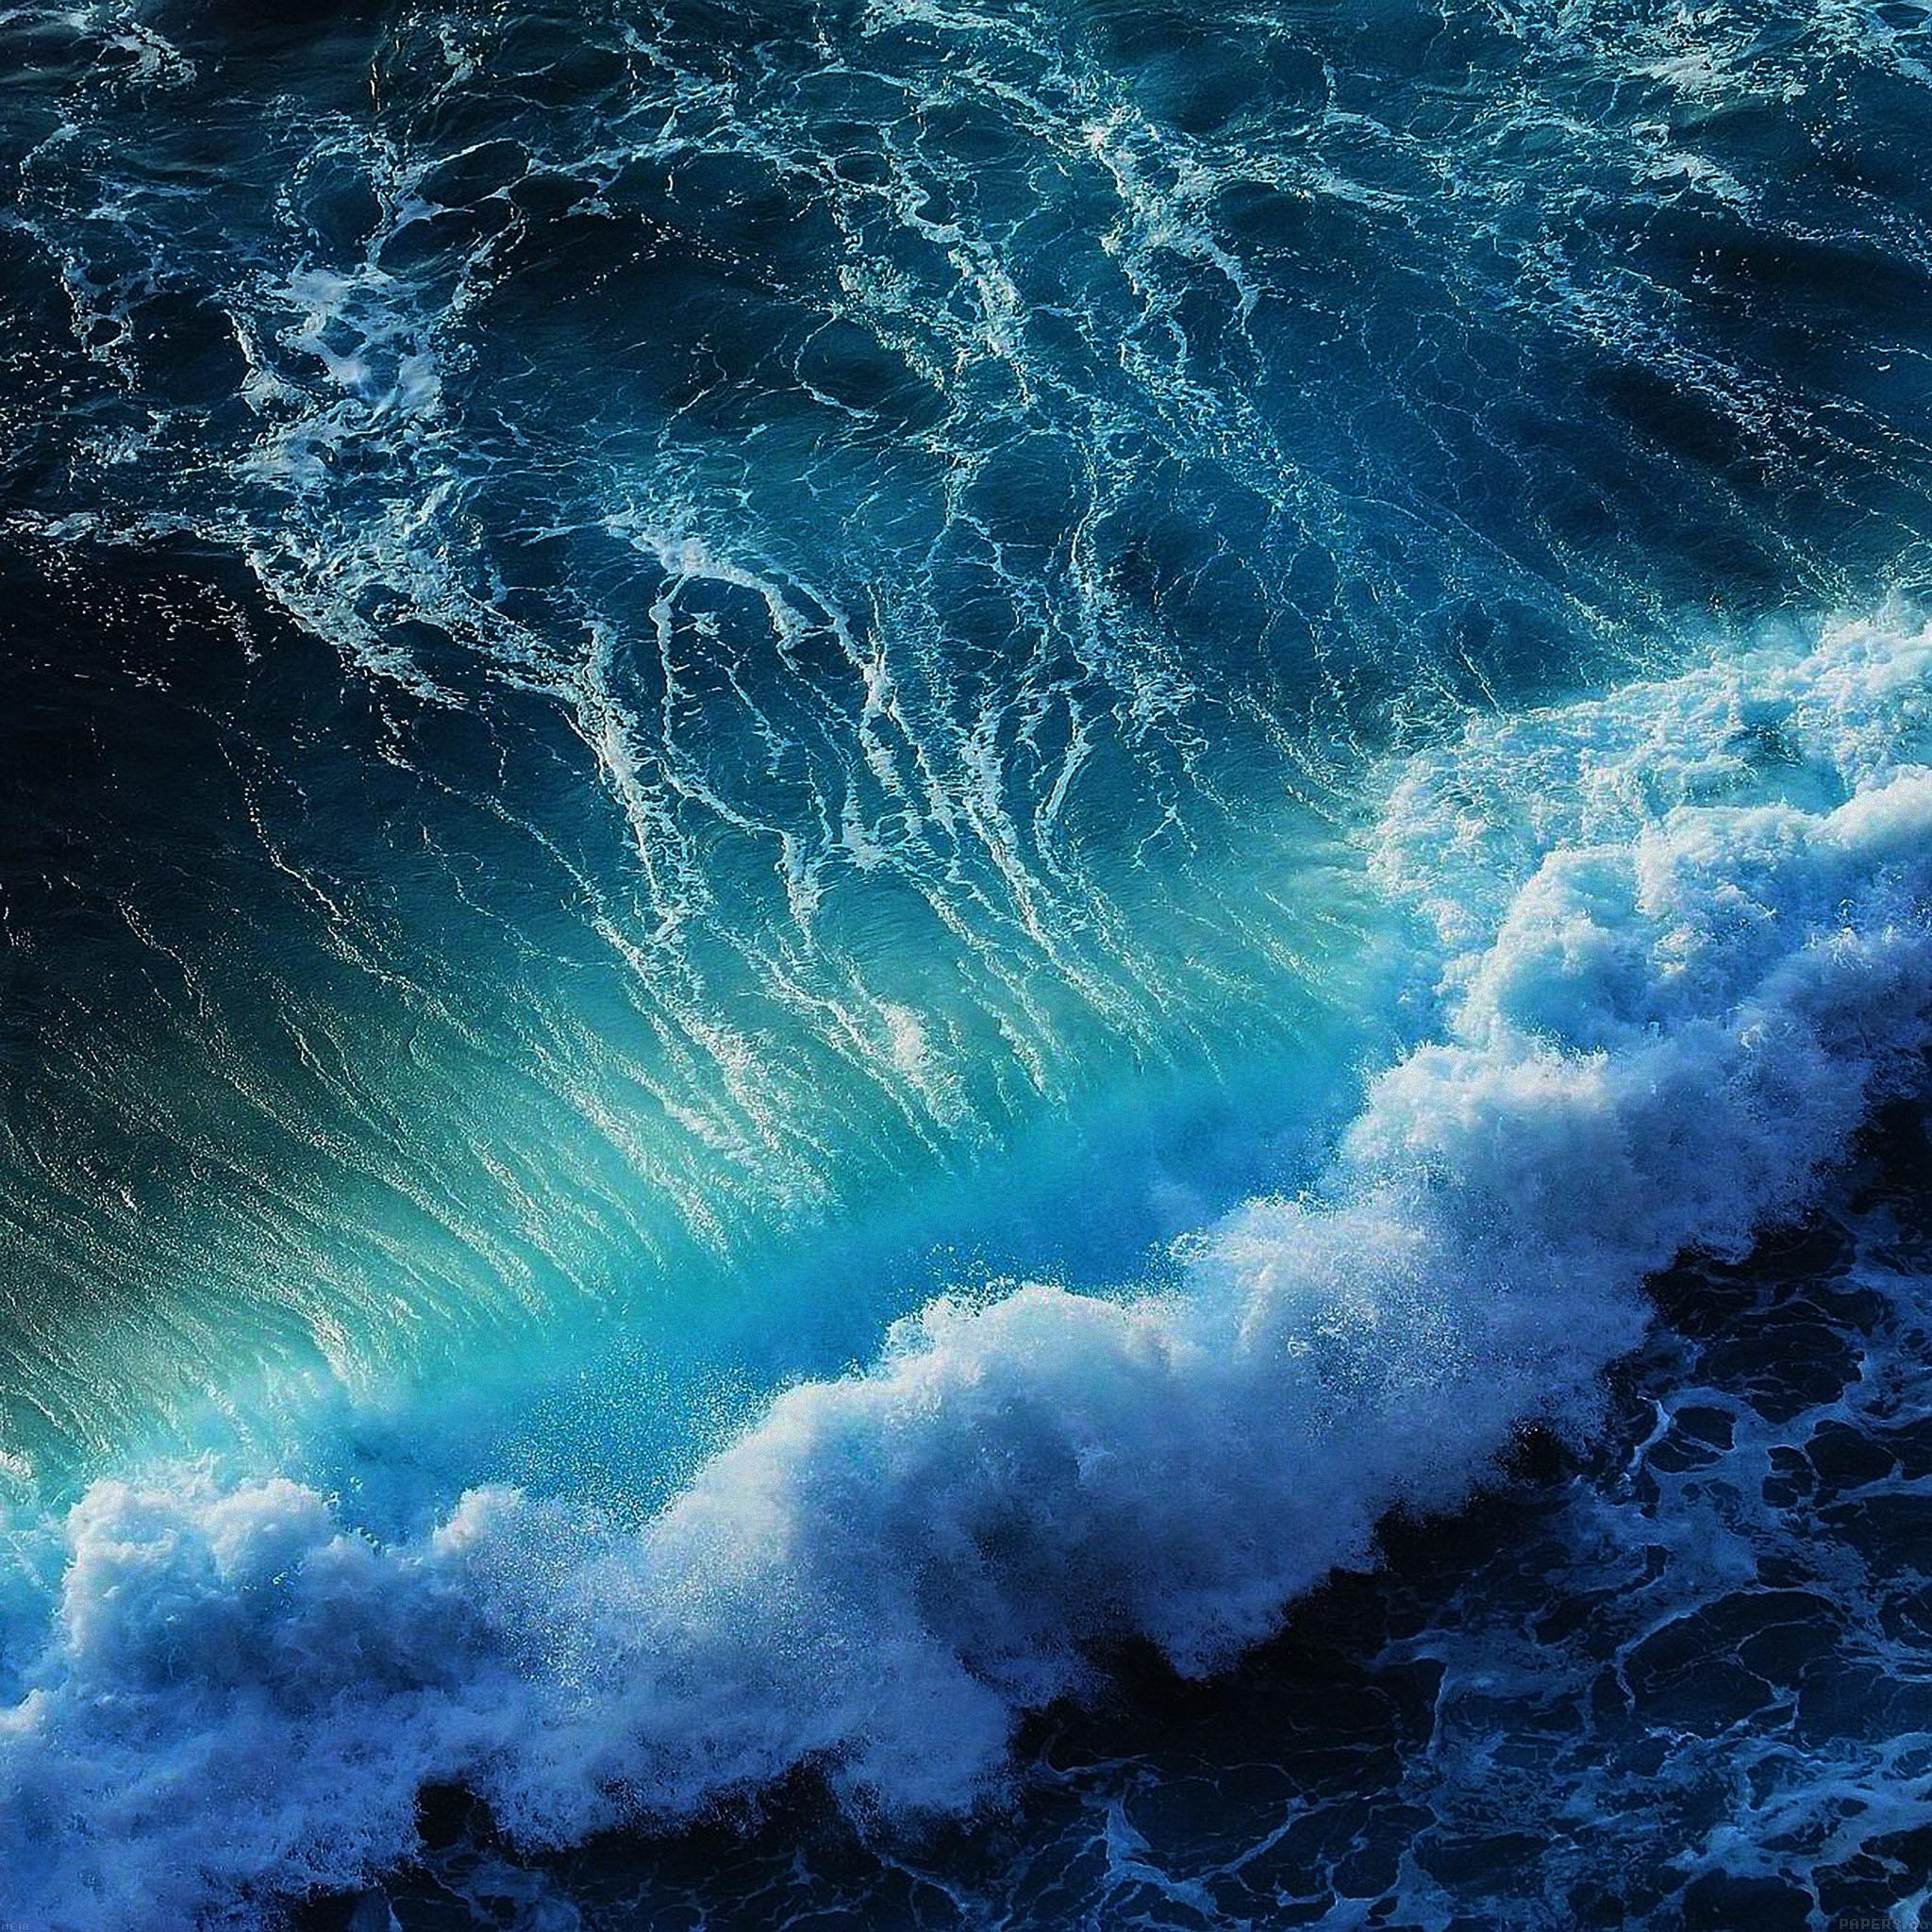 Ios 11 Hd Wallpaper Me18 Wave California Ocean Papers Co